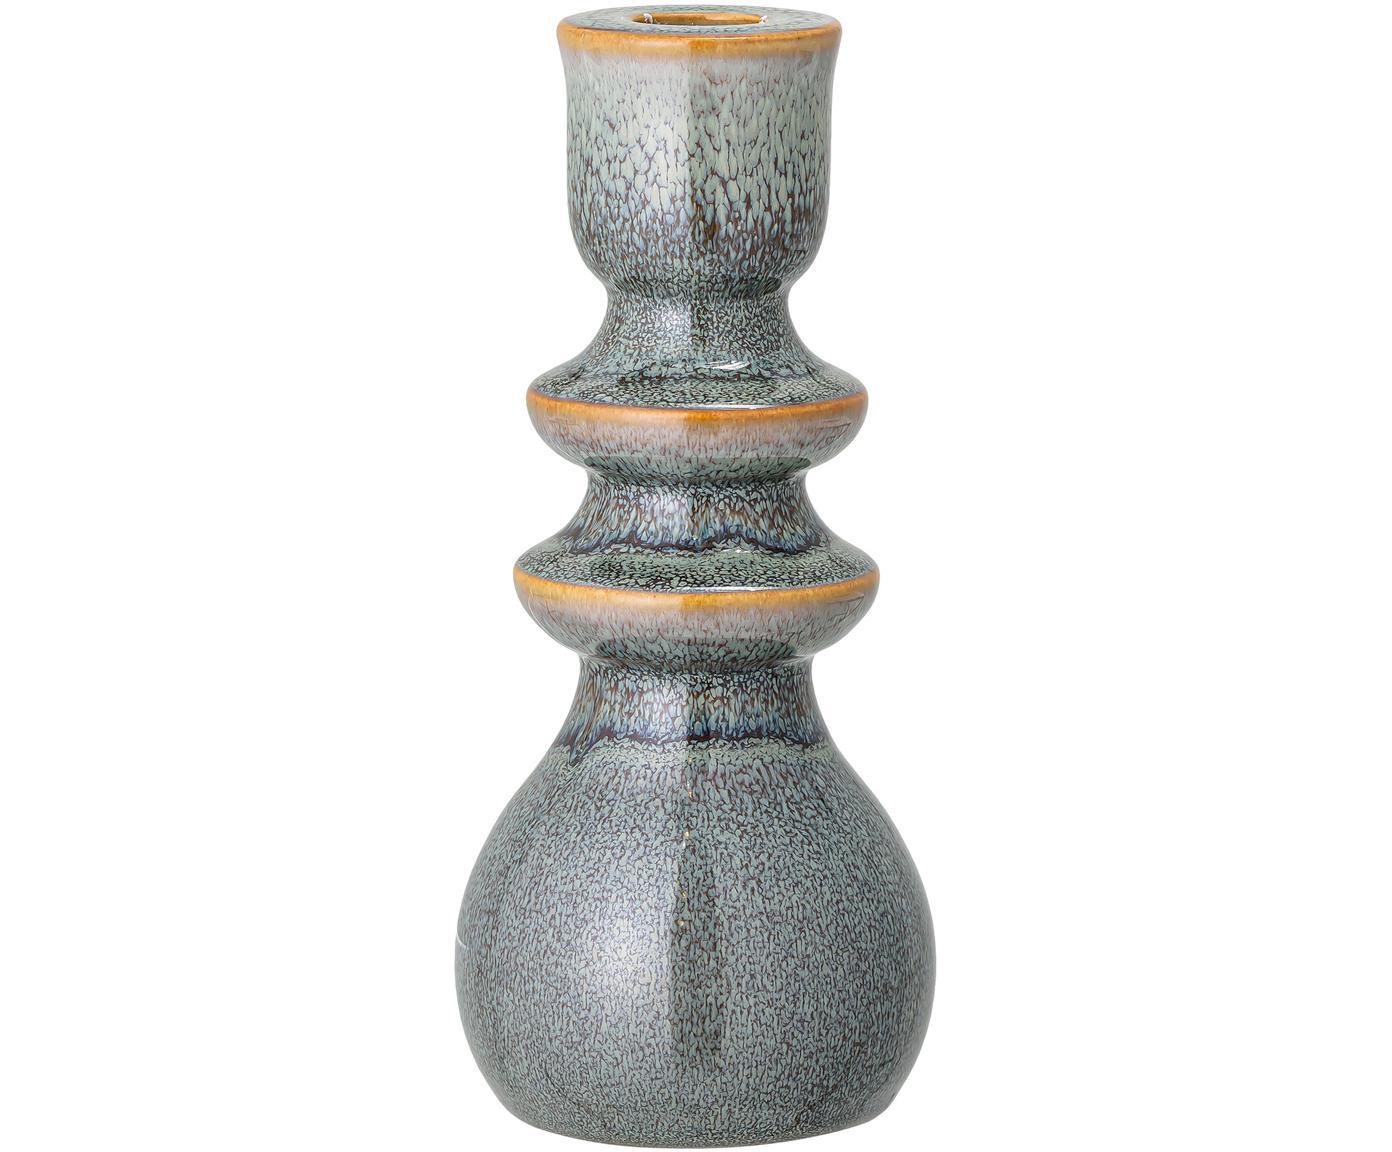 Candelabro fatto a mano Kit, Terracotta, Verde, marrone, Ø 8 x Alt. 19 cm